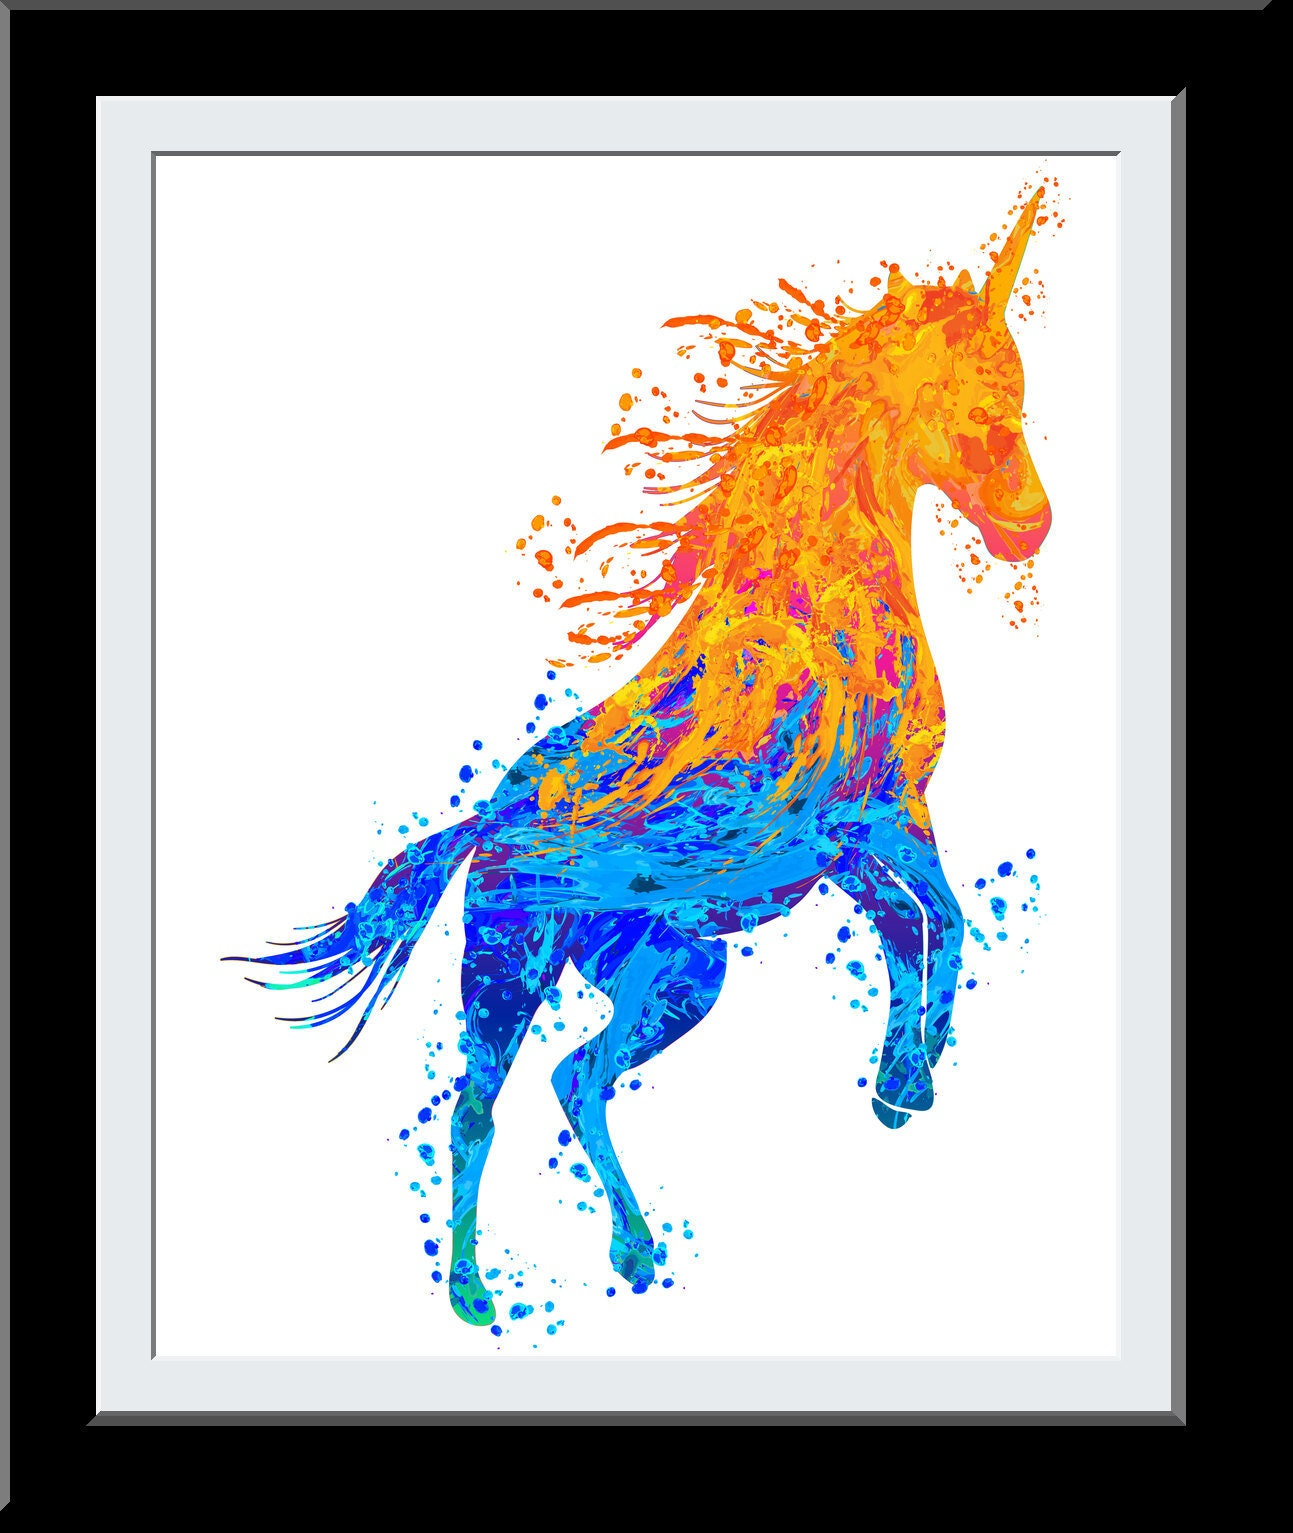 Unicorn Gift - Unicorn WaterColor Print - Fire+Water Elemental Digital Painting - Gift for Girls - Nursery Deor Wall Art